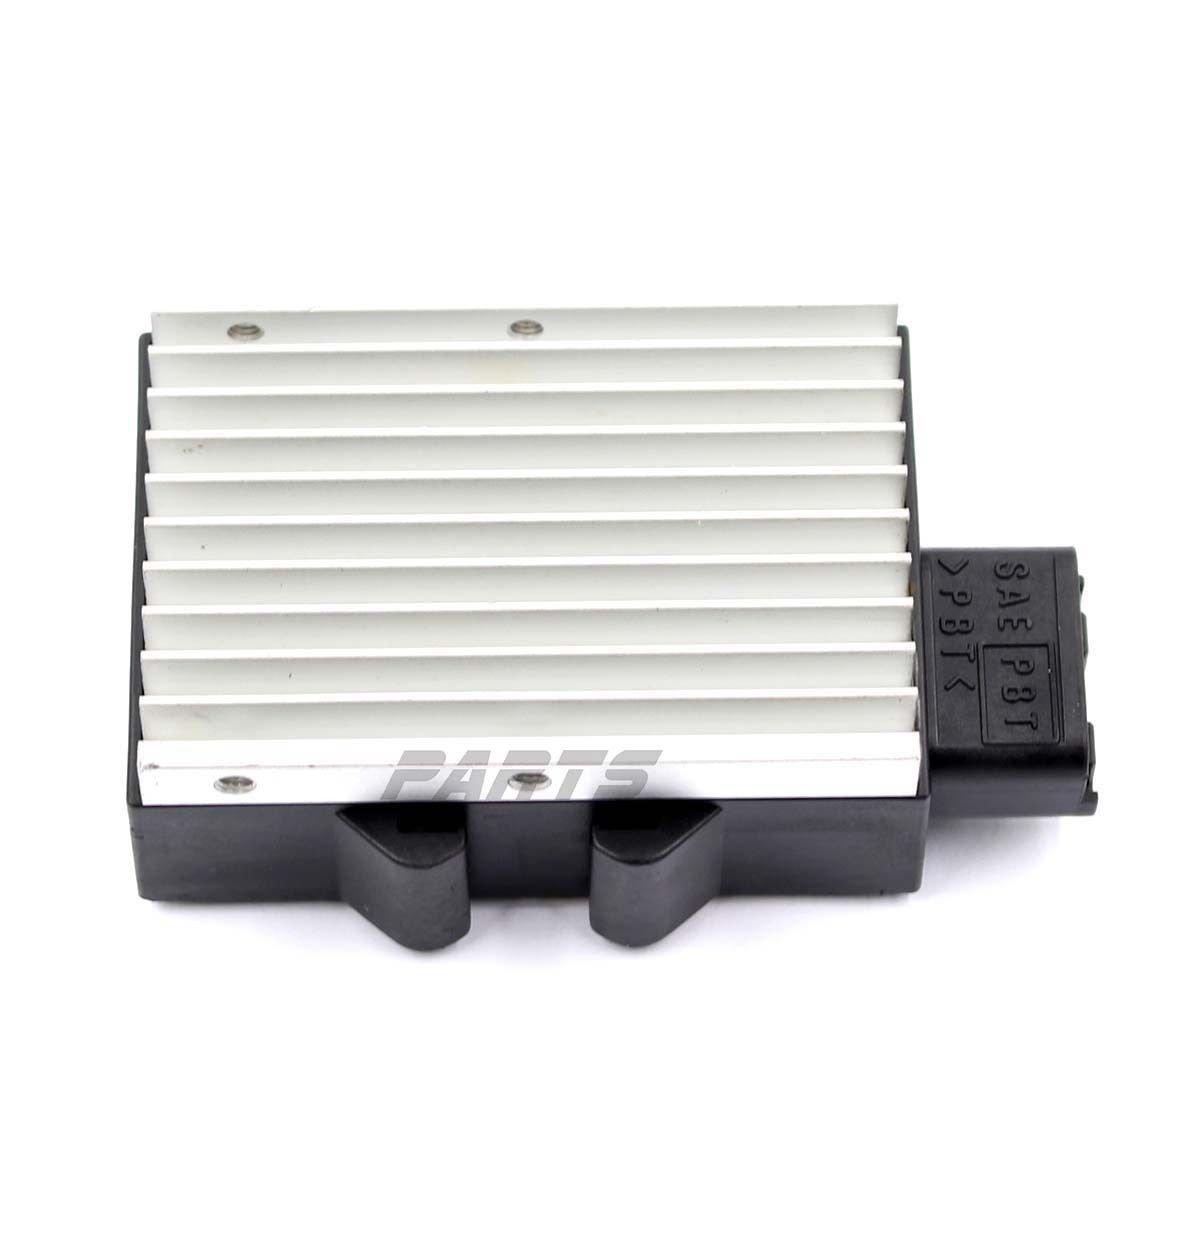 92 Lexus Sc300 Fuel Pump Ecu Location Wiring Diagram Amazoncom Oem Denso Control 89570 24010 For 1992